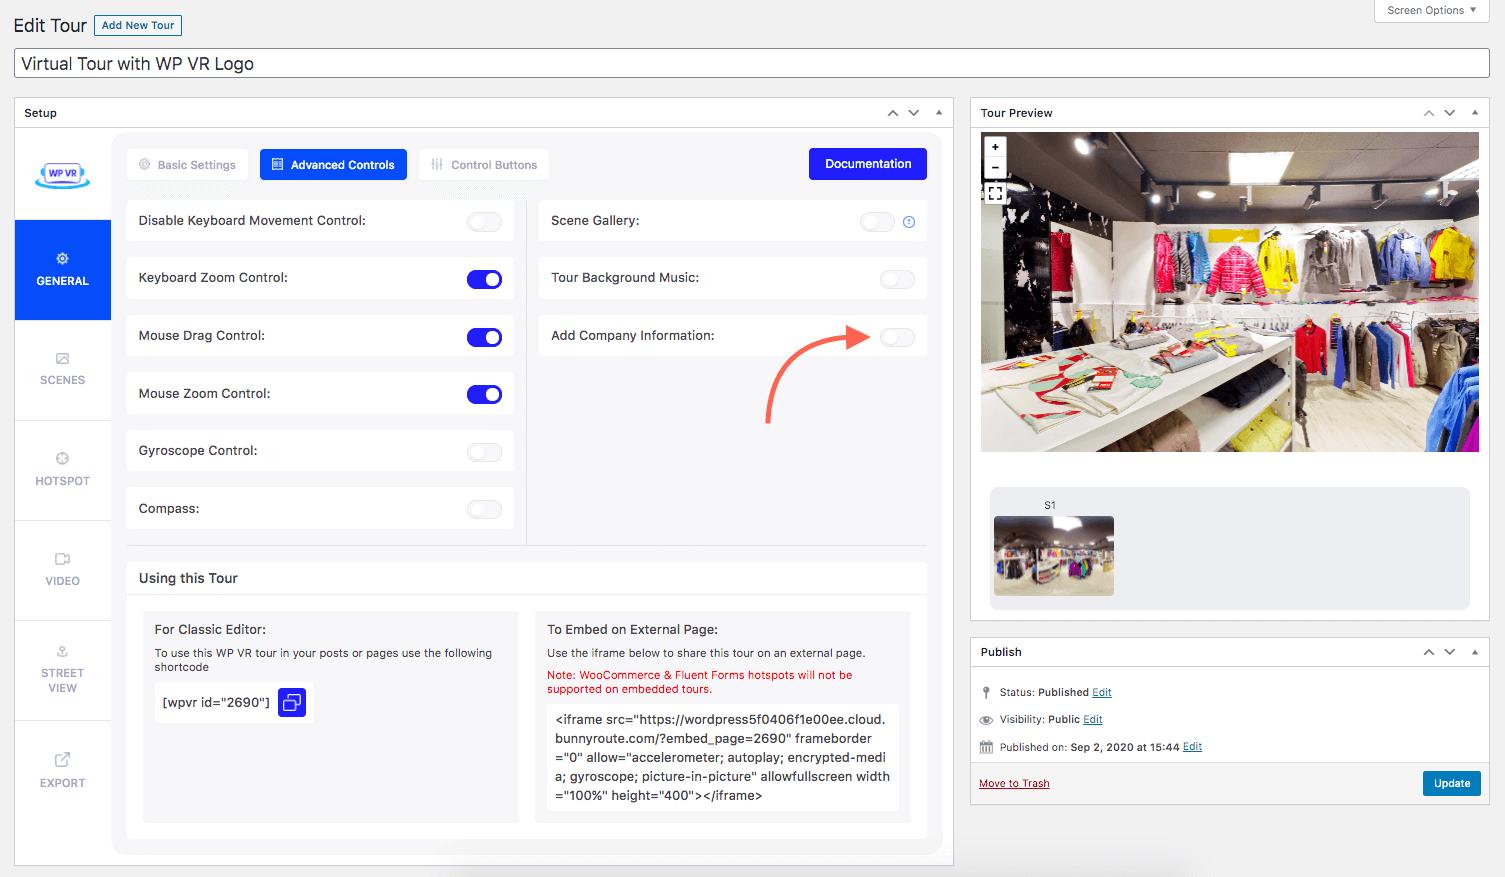 Option - Add Company Information